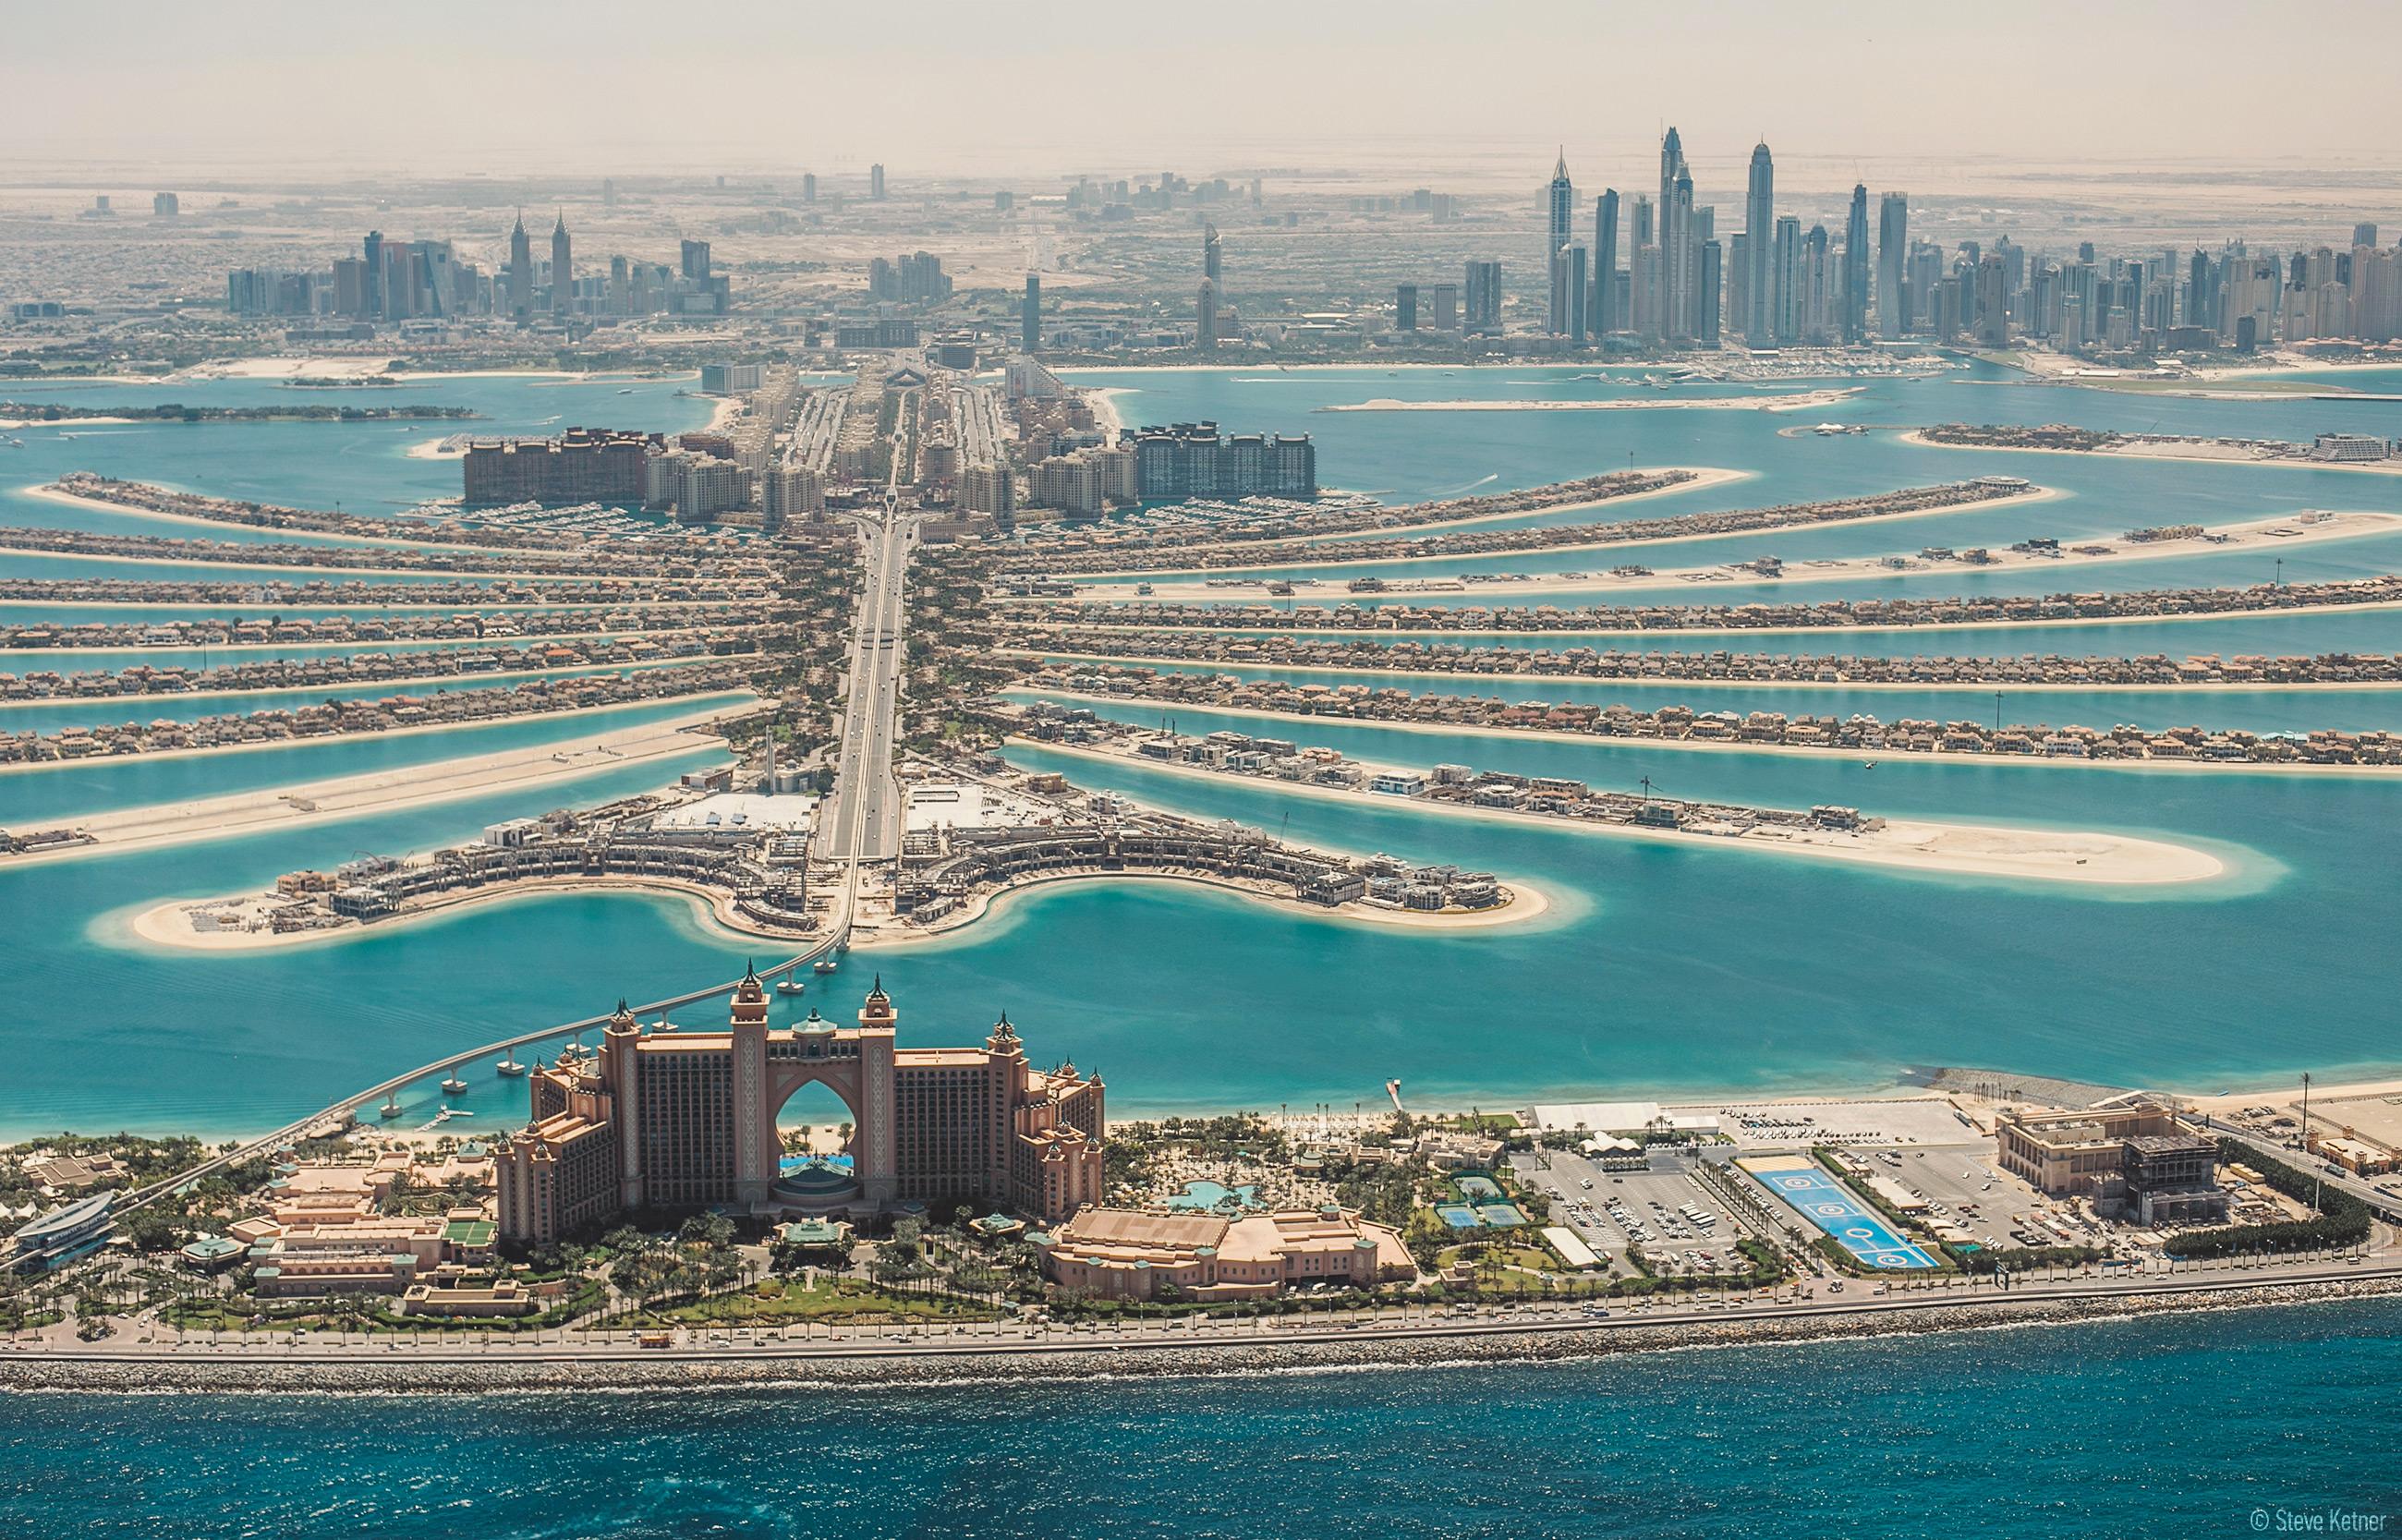 Steve Ketner - The Lost Chambers Aquarium in Palm Jumeirah, Dubai